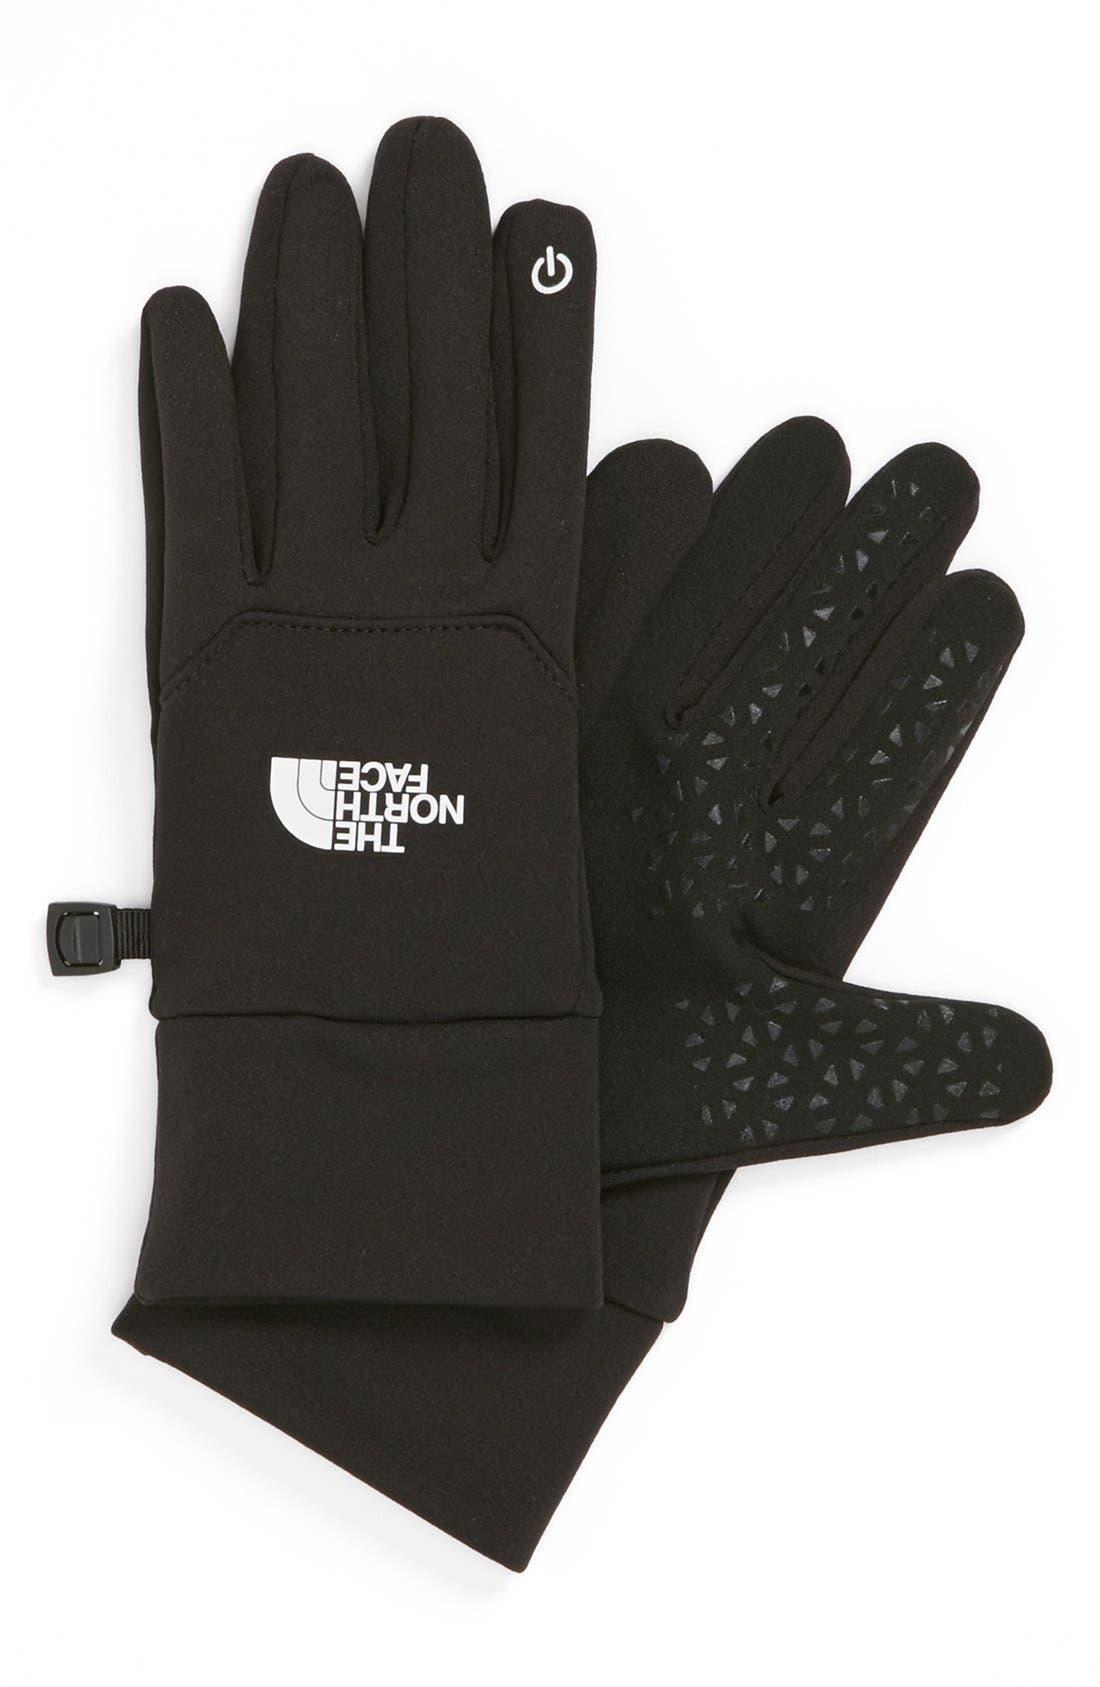 THE NORTH FACE, 'E-Tip' Glove, Main thumbnail 1, color, 001